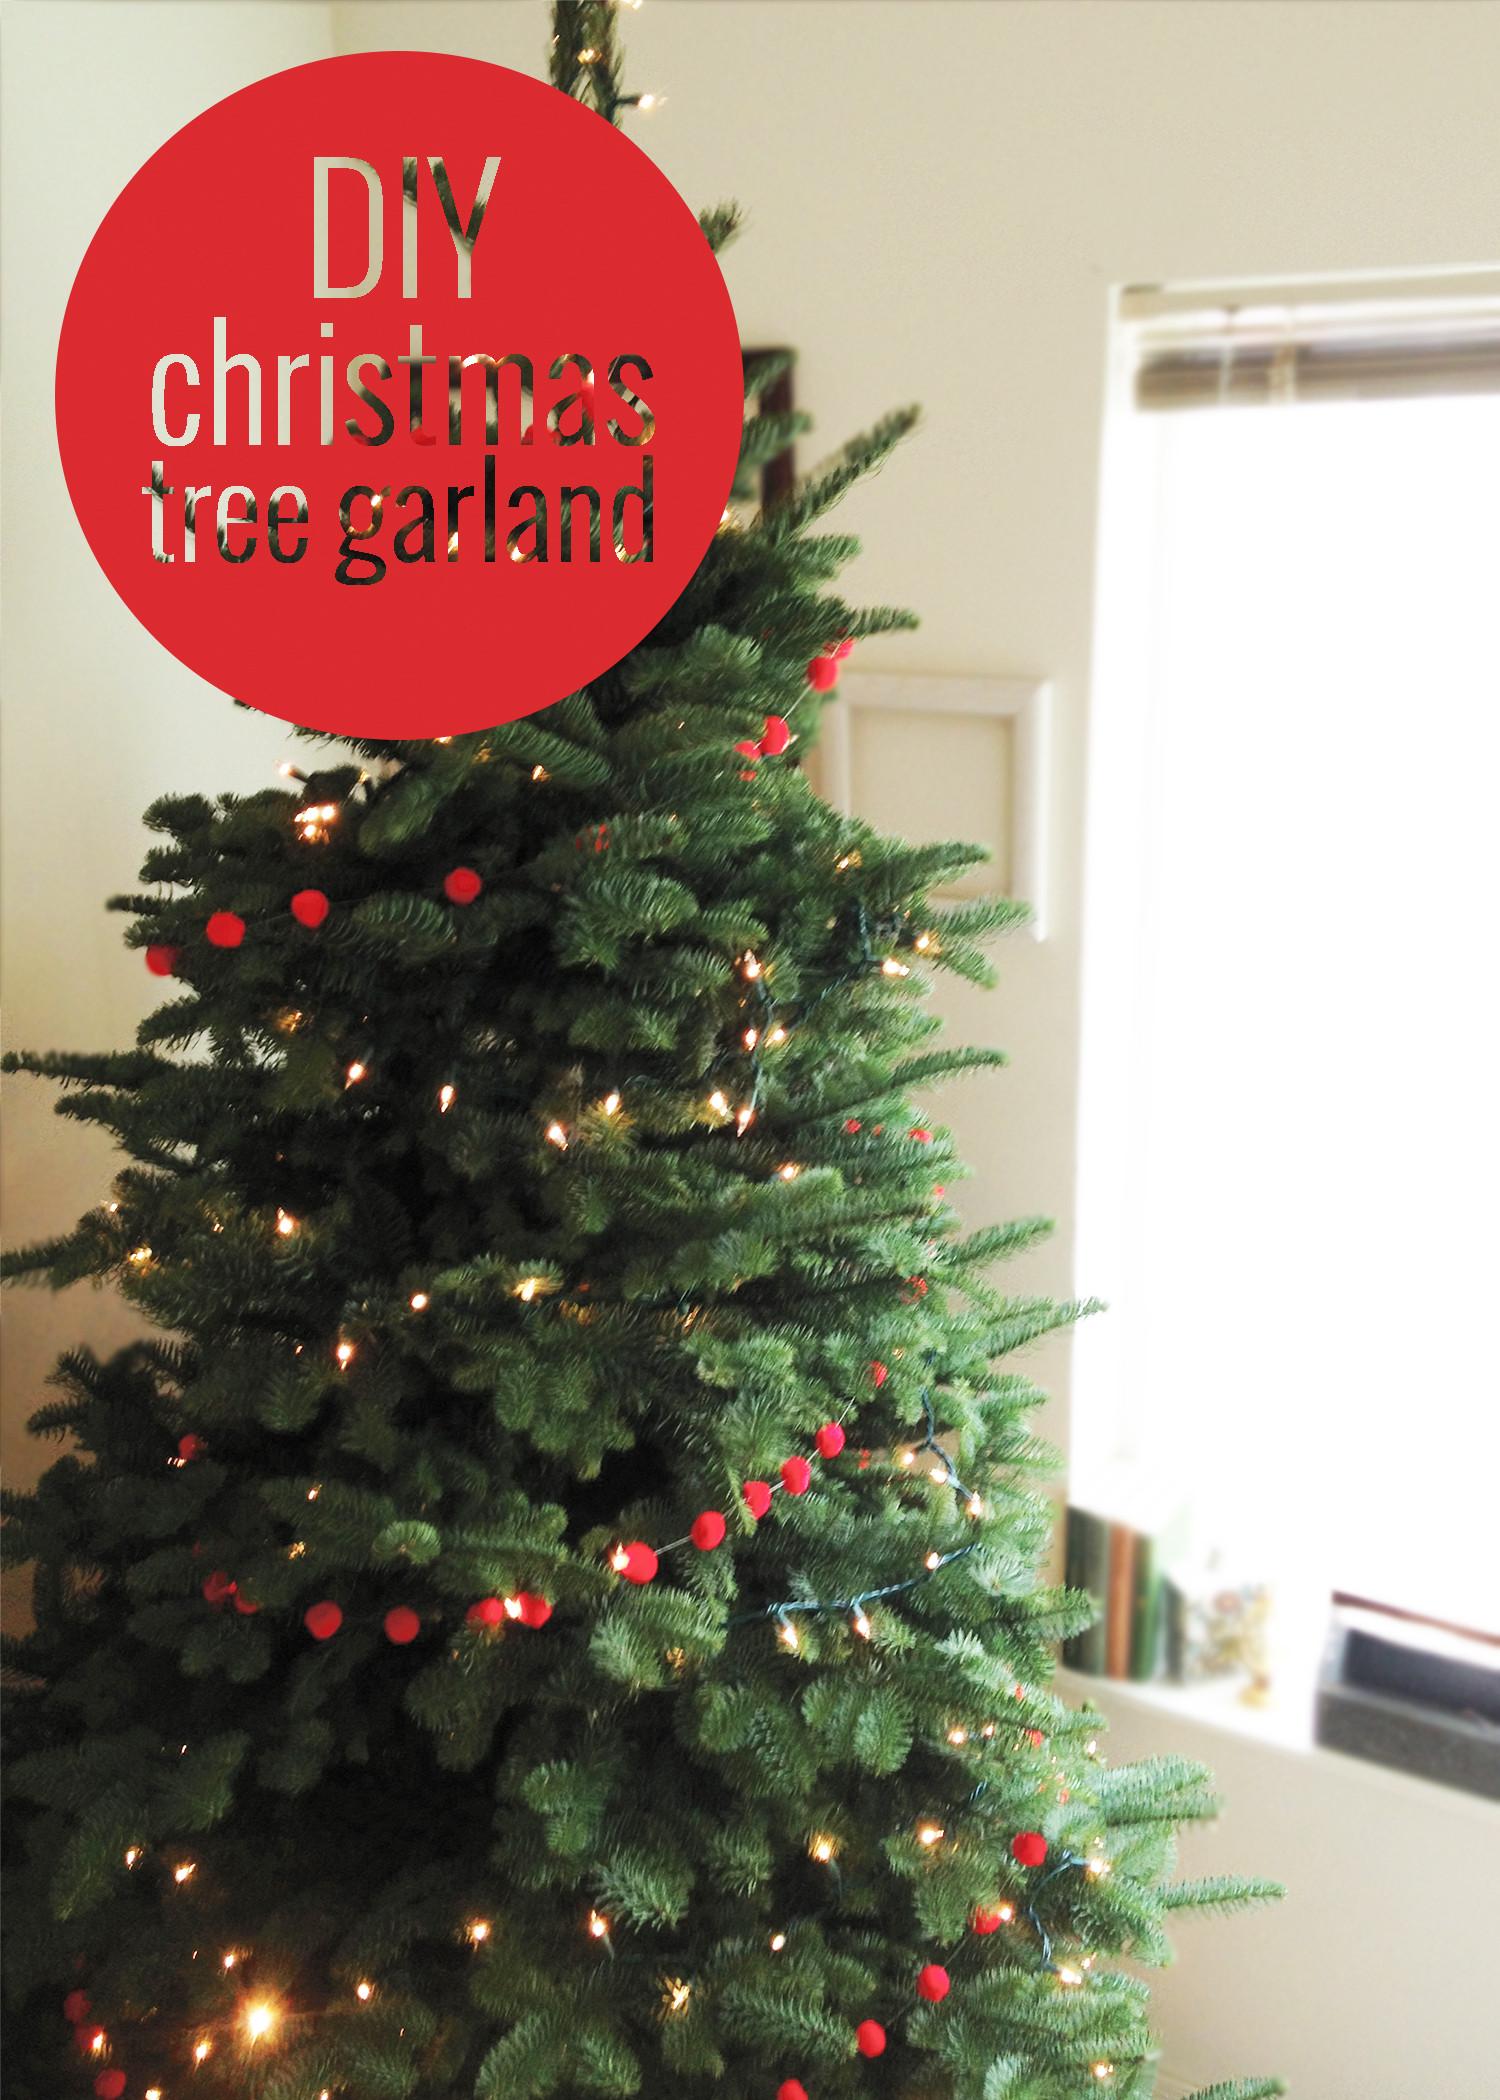 DIY Christmas Tree Garland  DIY Christmas Tree Garland